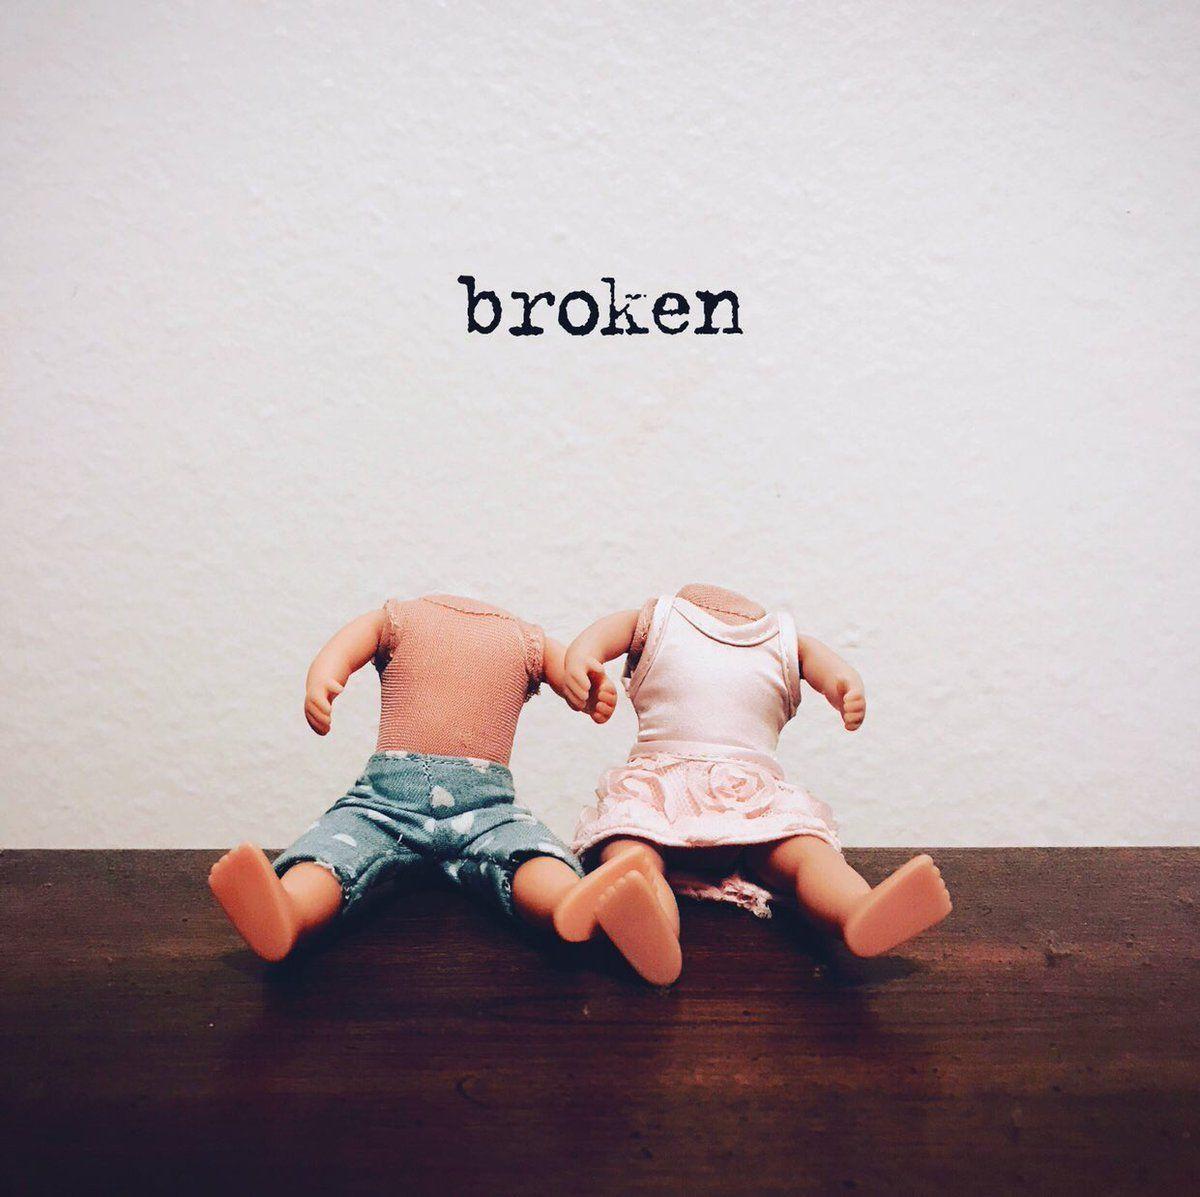 Find lovelytheband – broken lyrics and search for